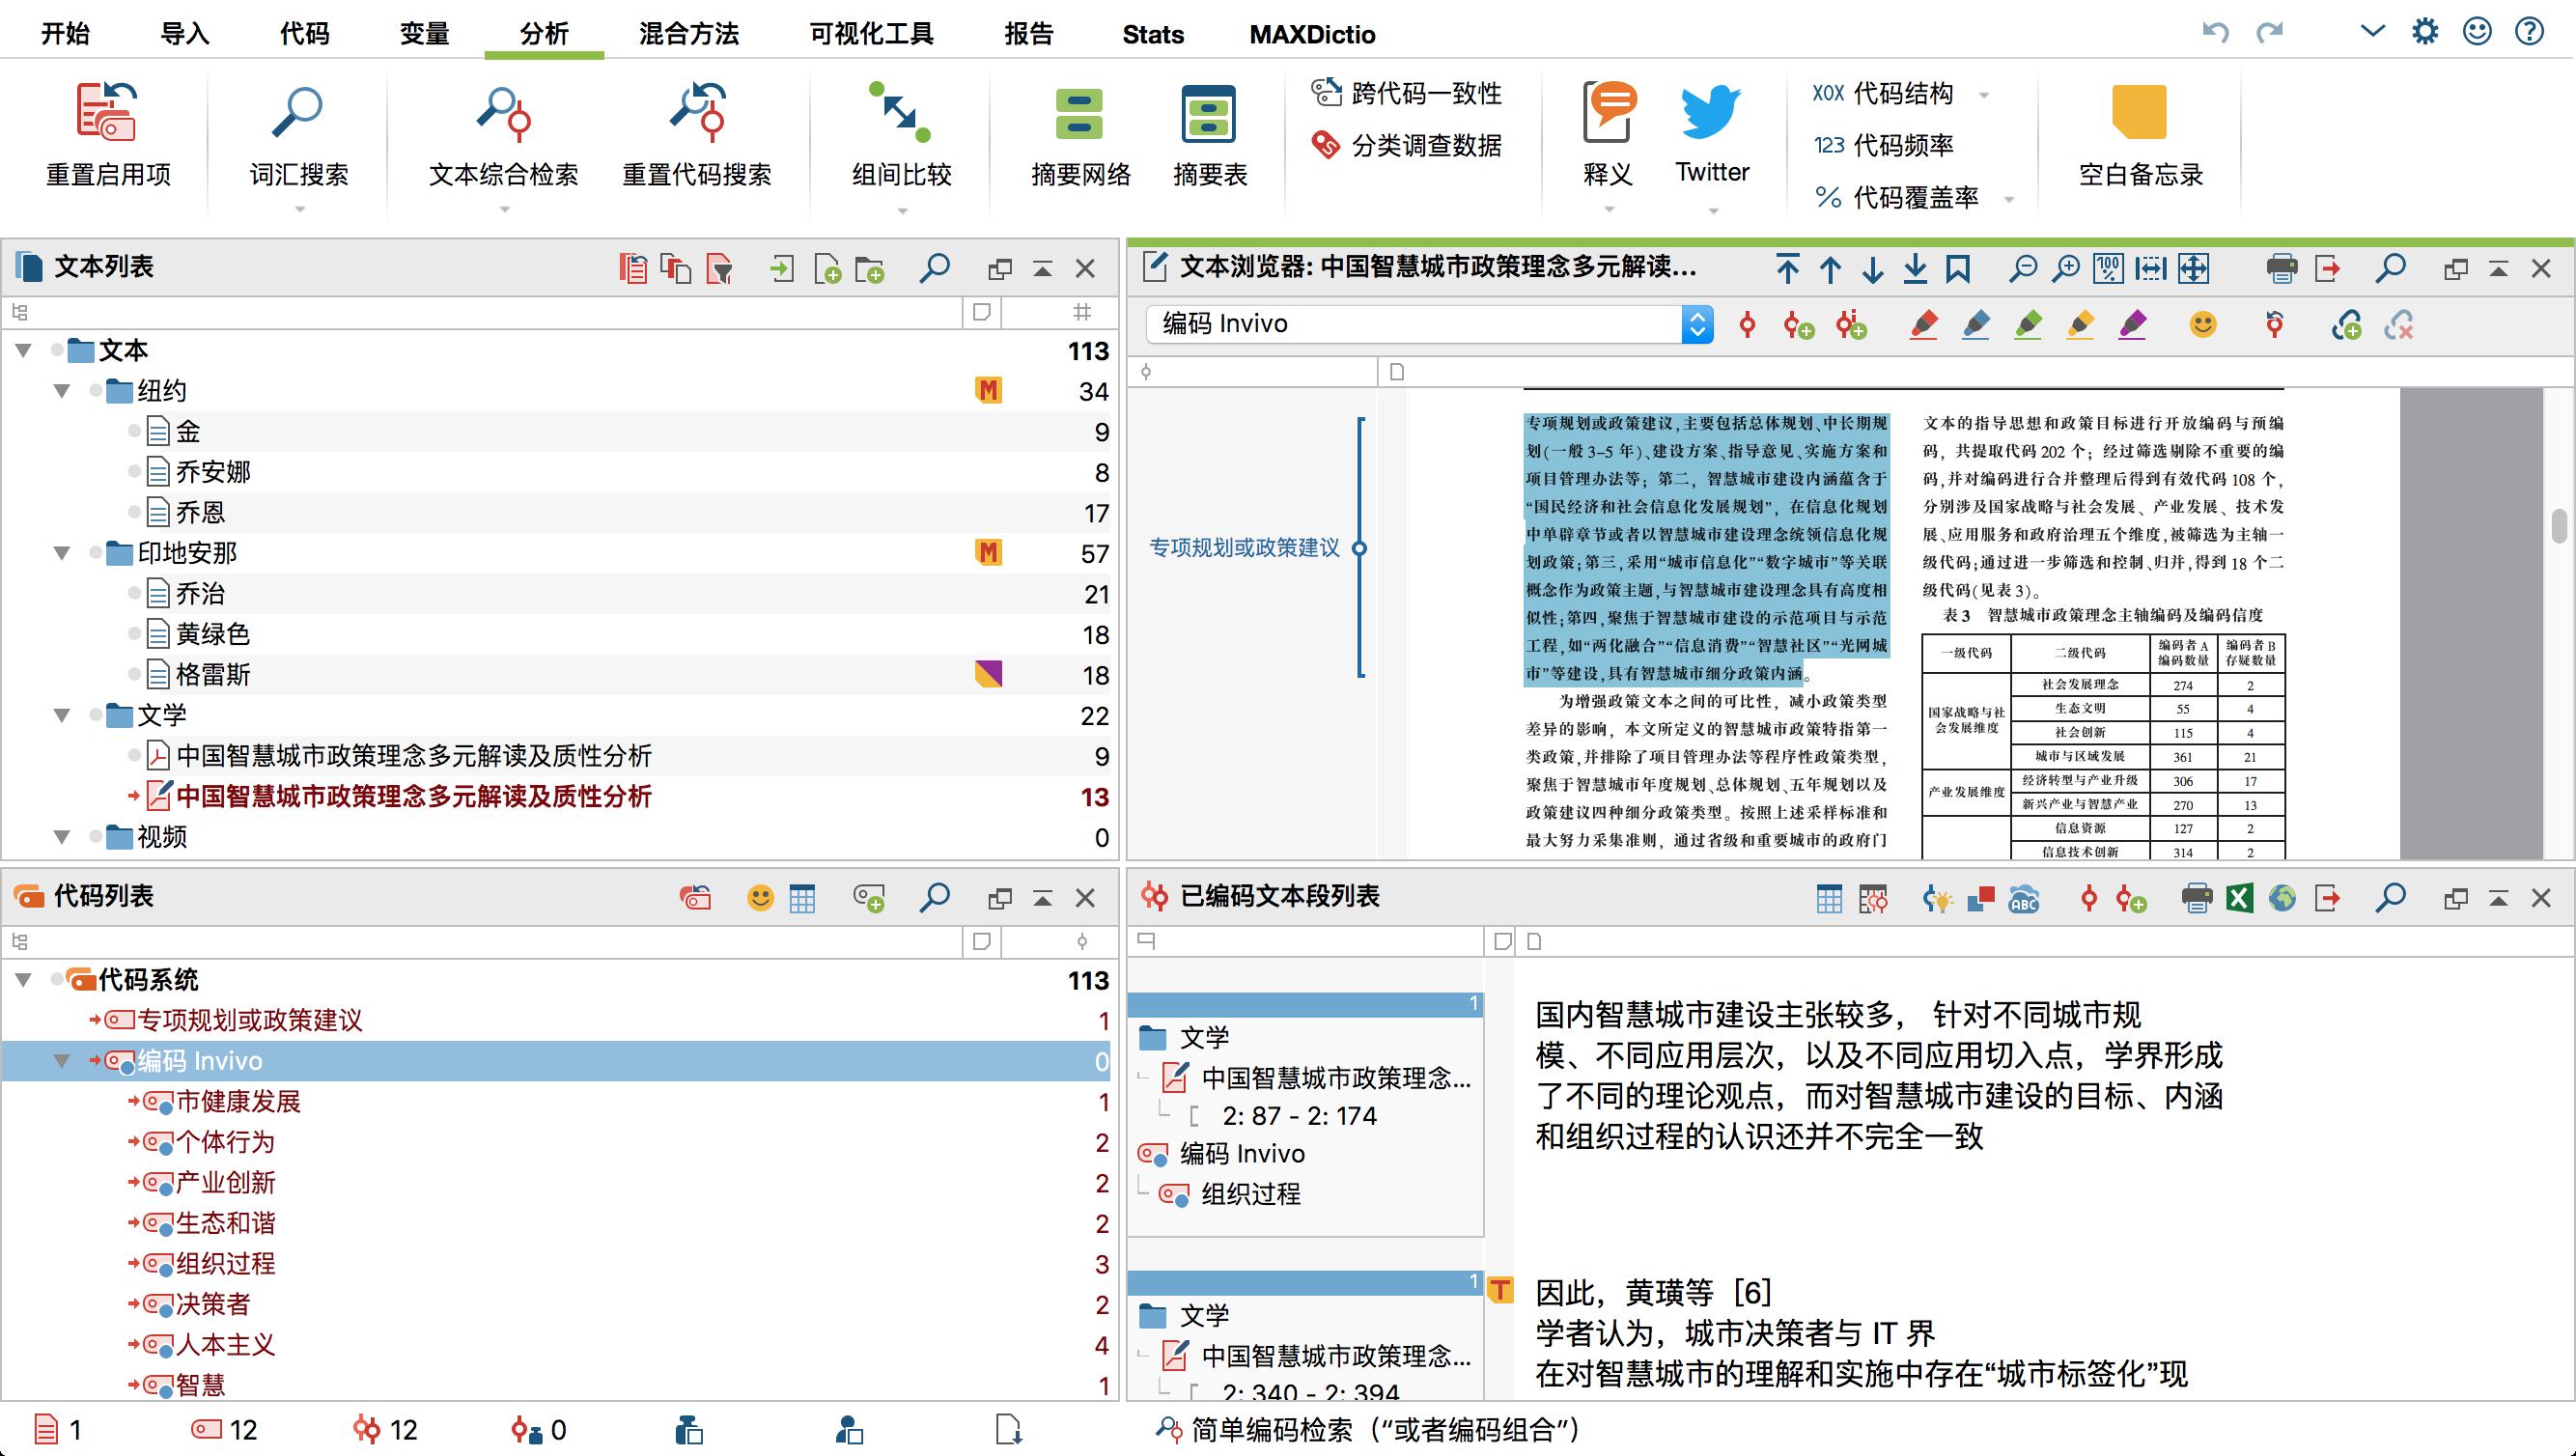 MAXQDA 2018 user interface